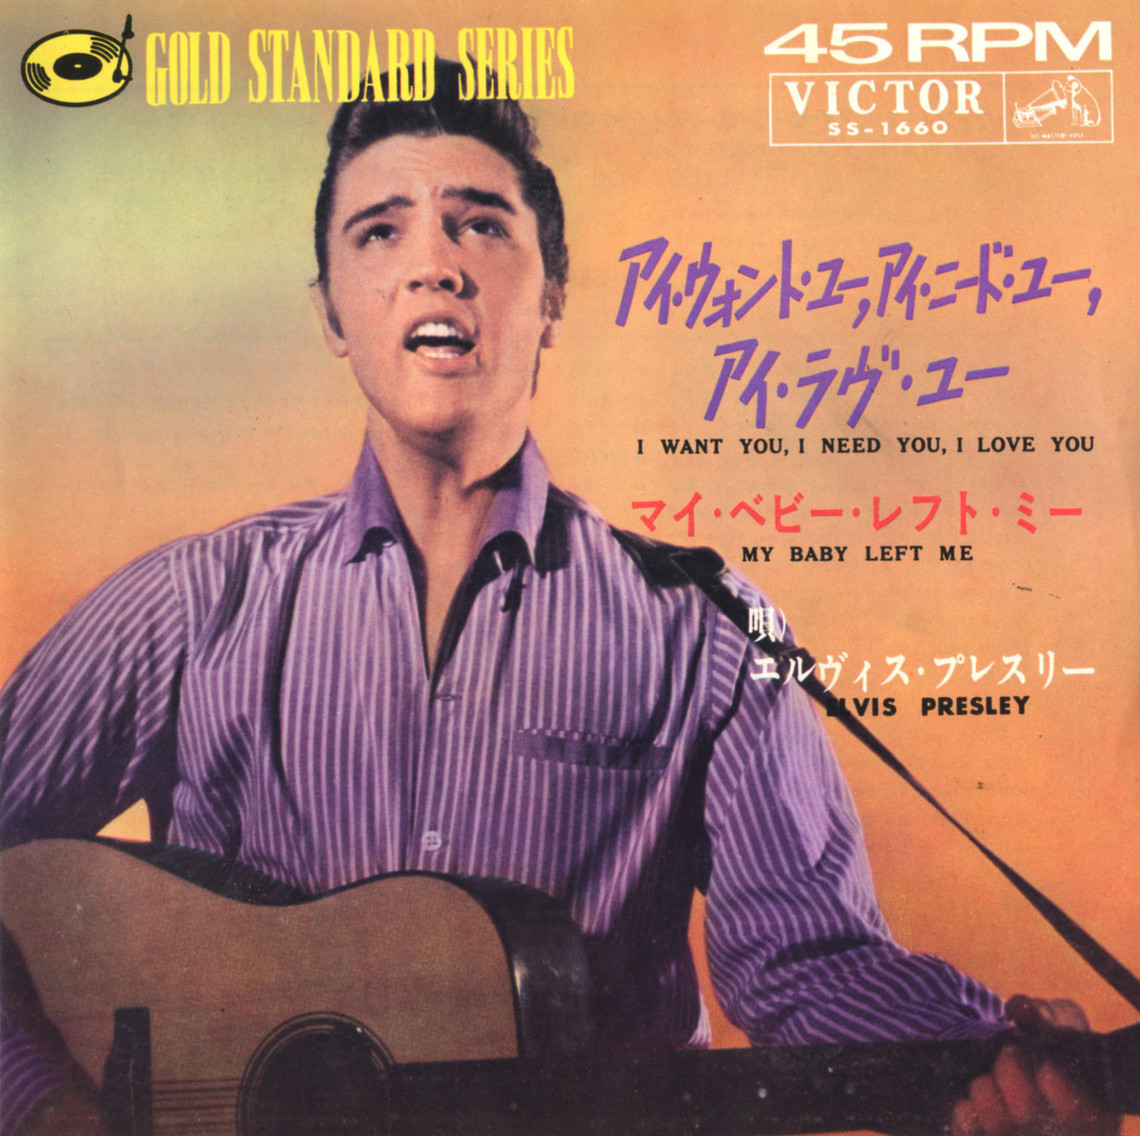 Diskografie Japan 1955 - 1977 Ss-1660y4rsg